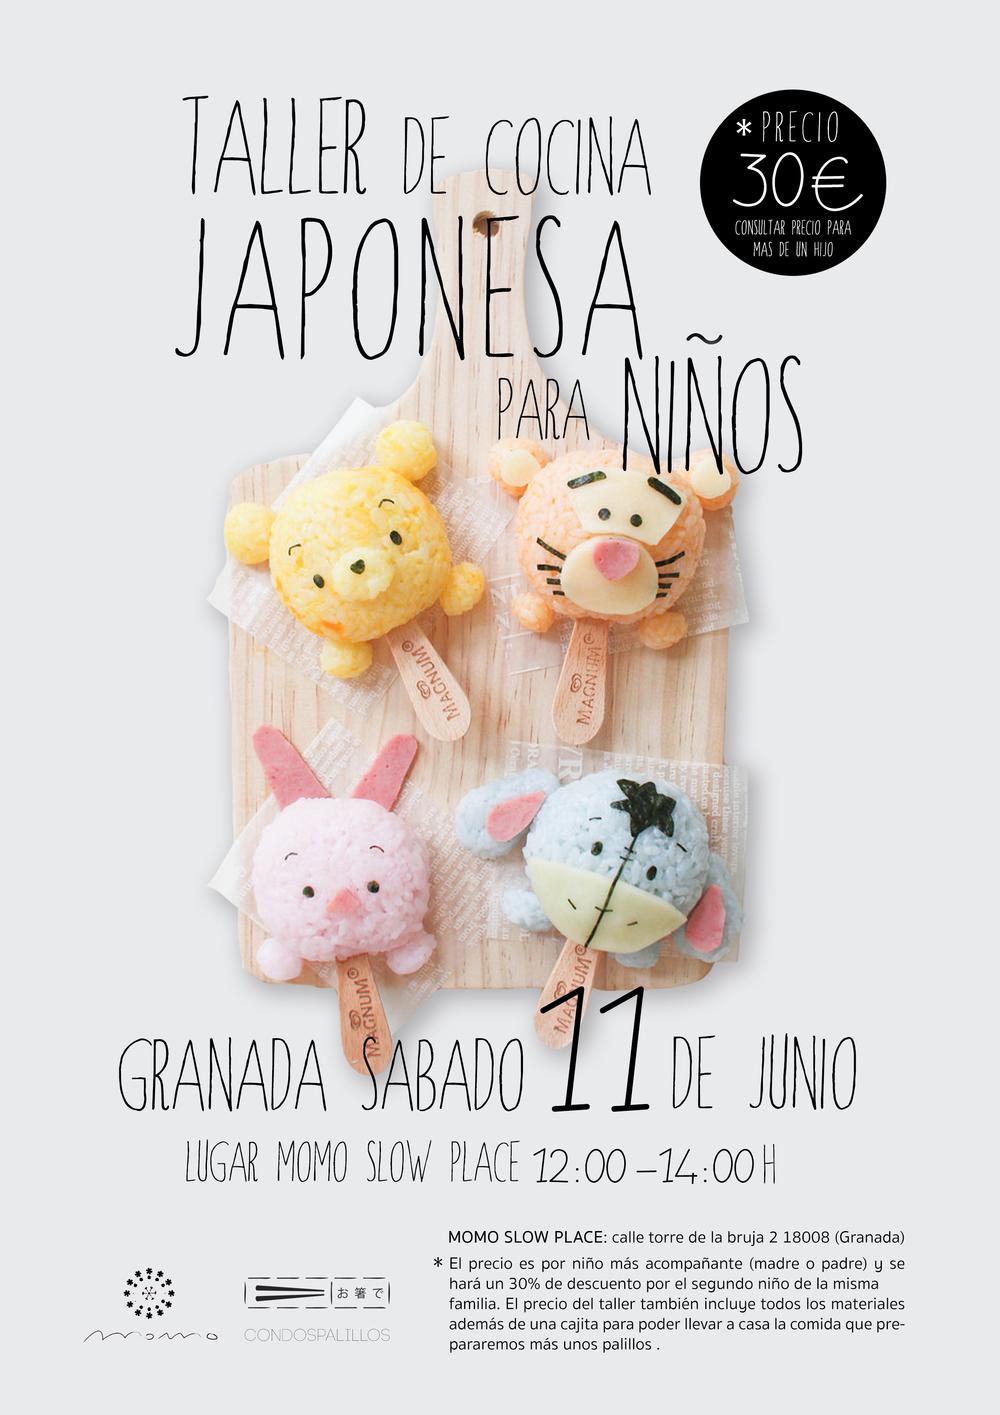 Taller De Cocina Teruel Of Fideos Soba Con Salsa De S Samo Condospalillos Food